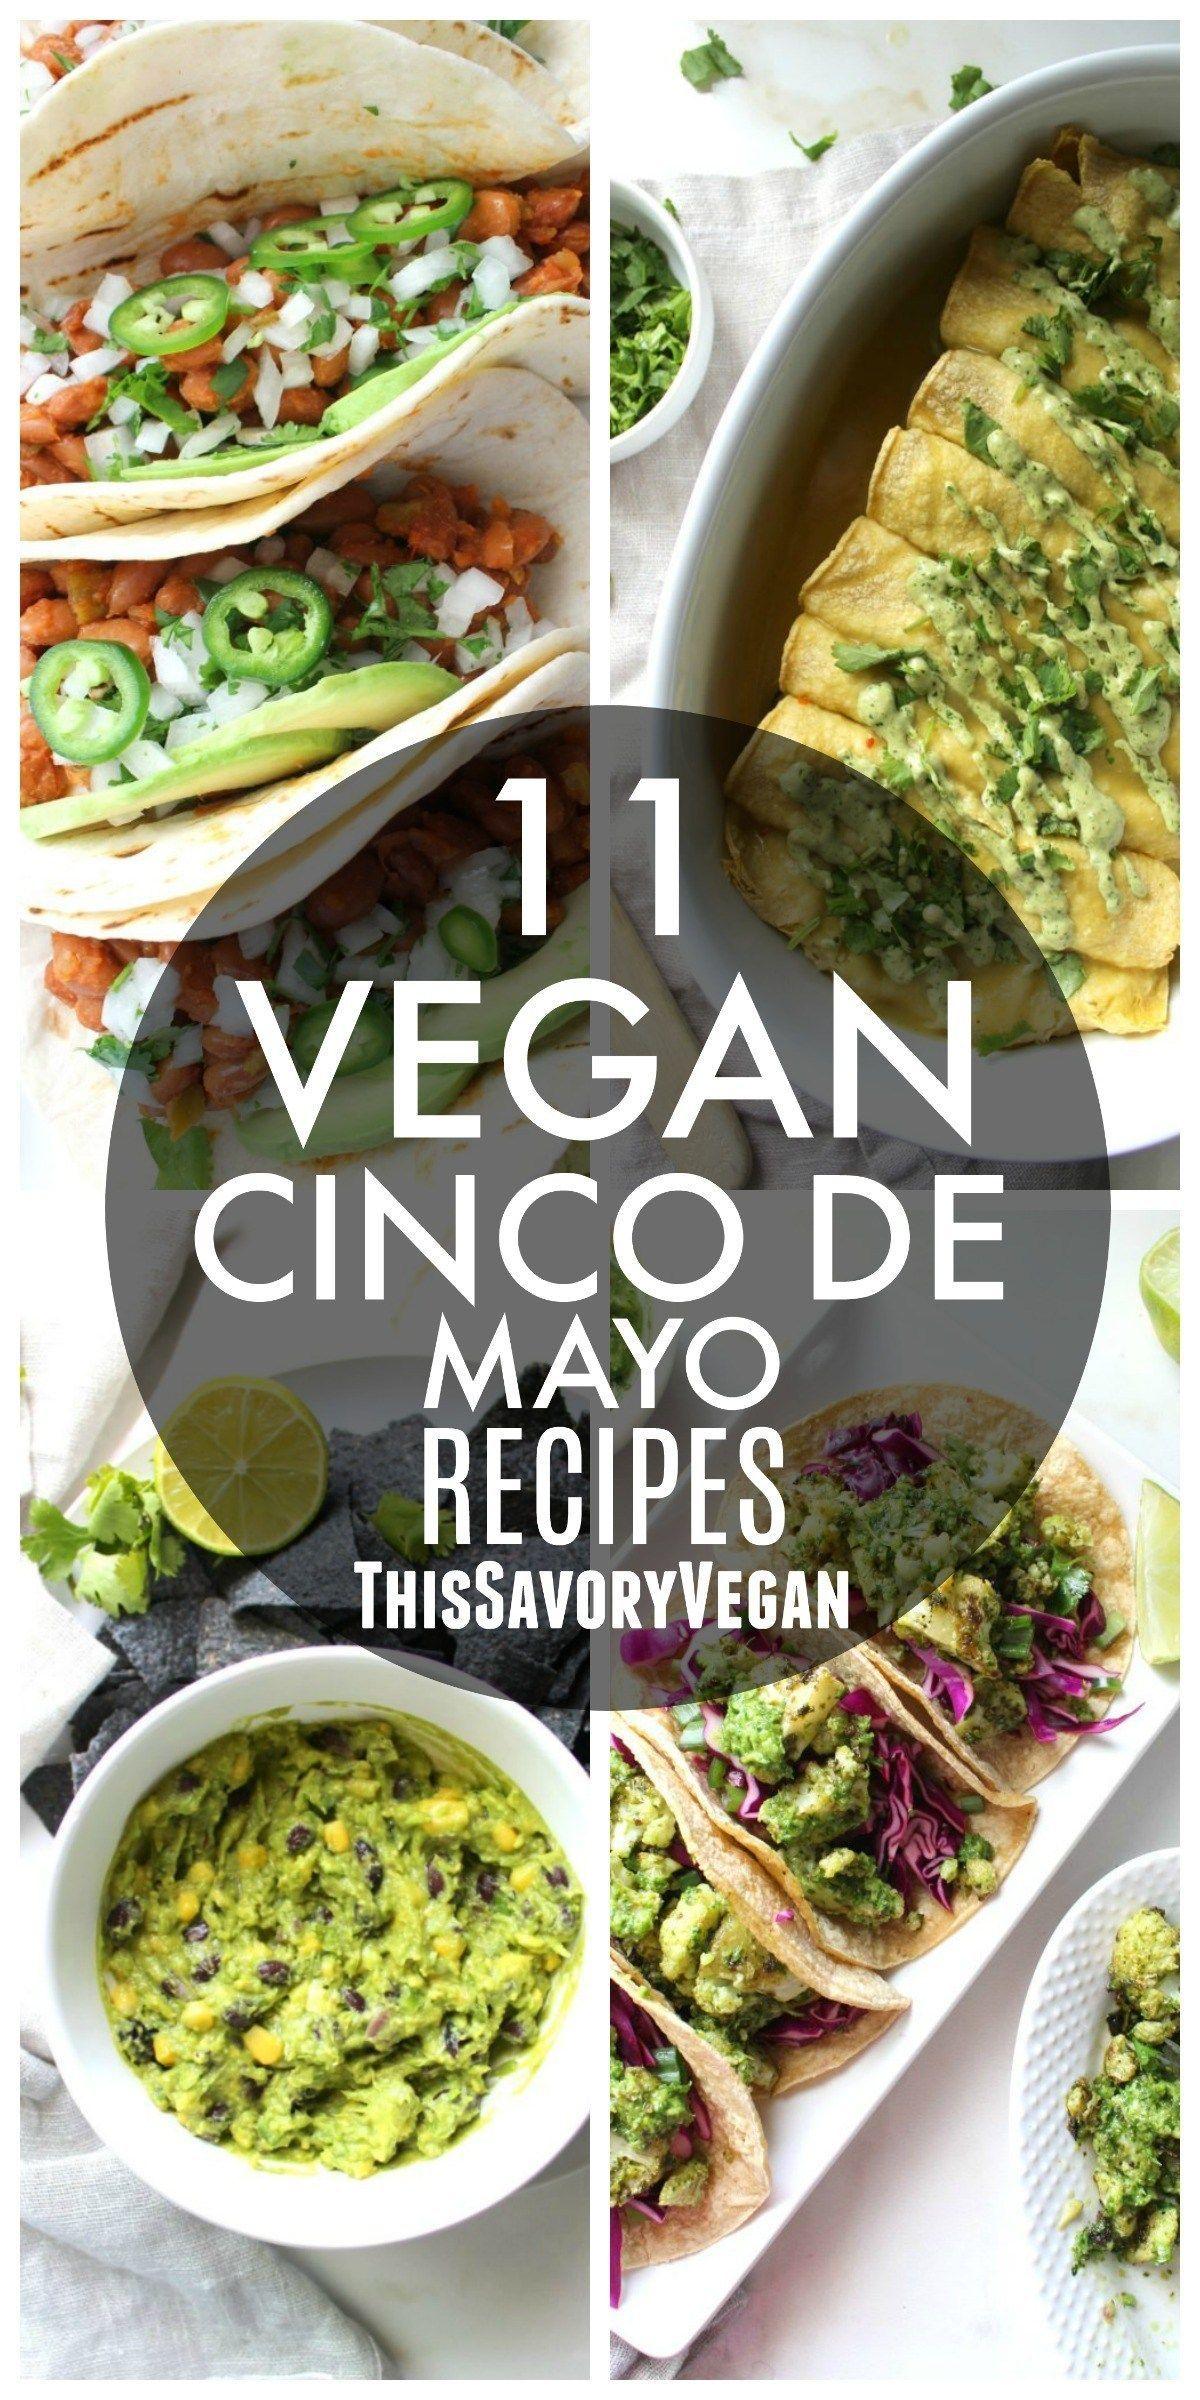 Vegan Cinco de Mayo Recipe Round-Up Vegan Cinco de Mayo Recipe Round-Up - This Savory Vegan